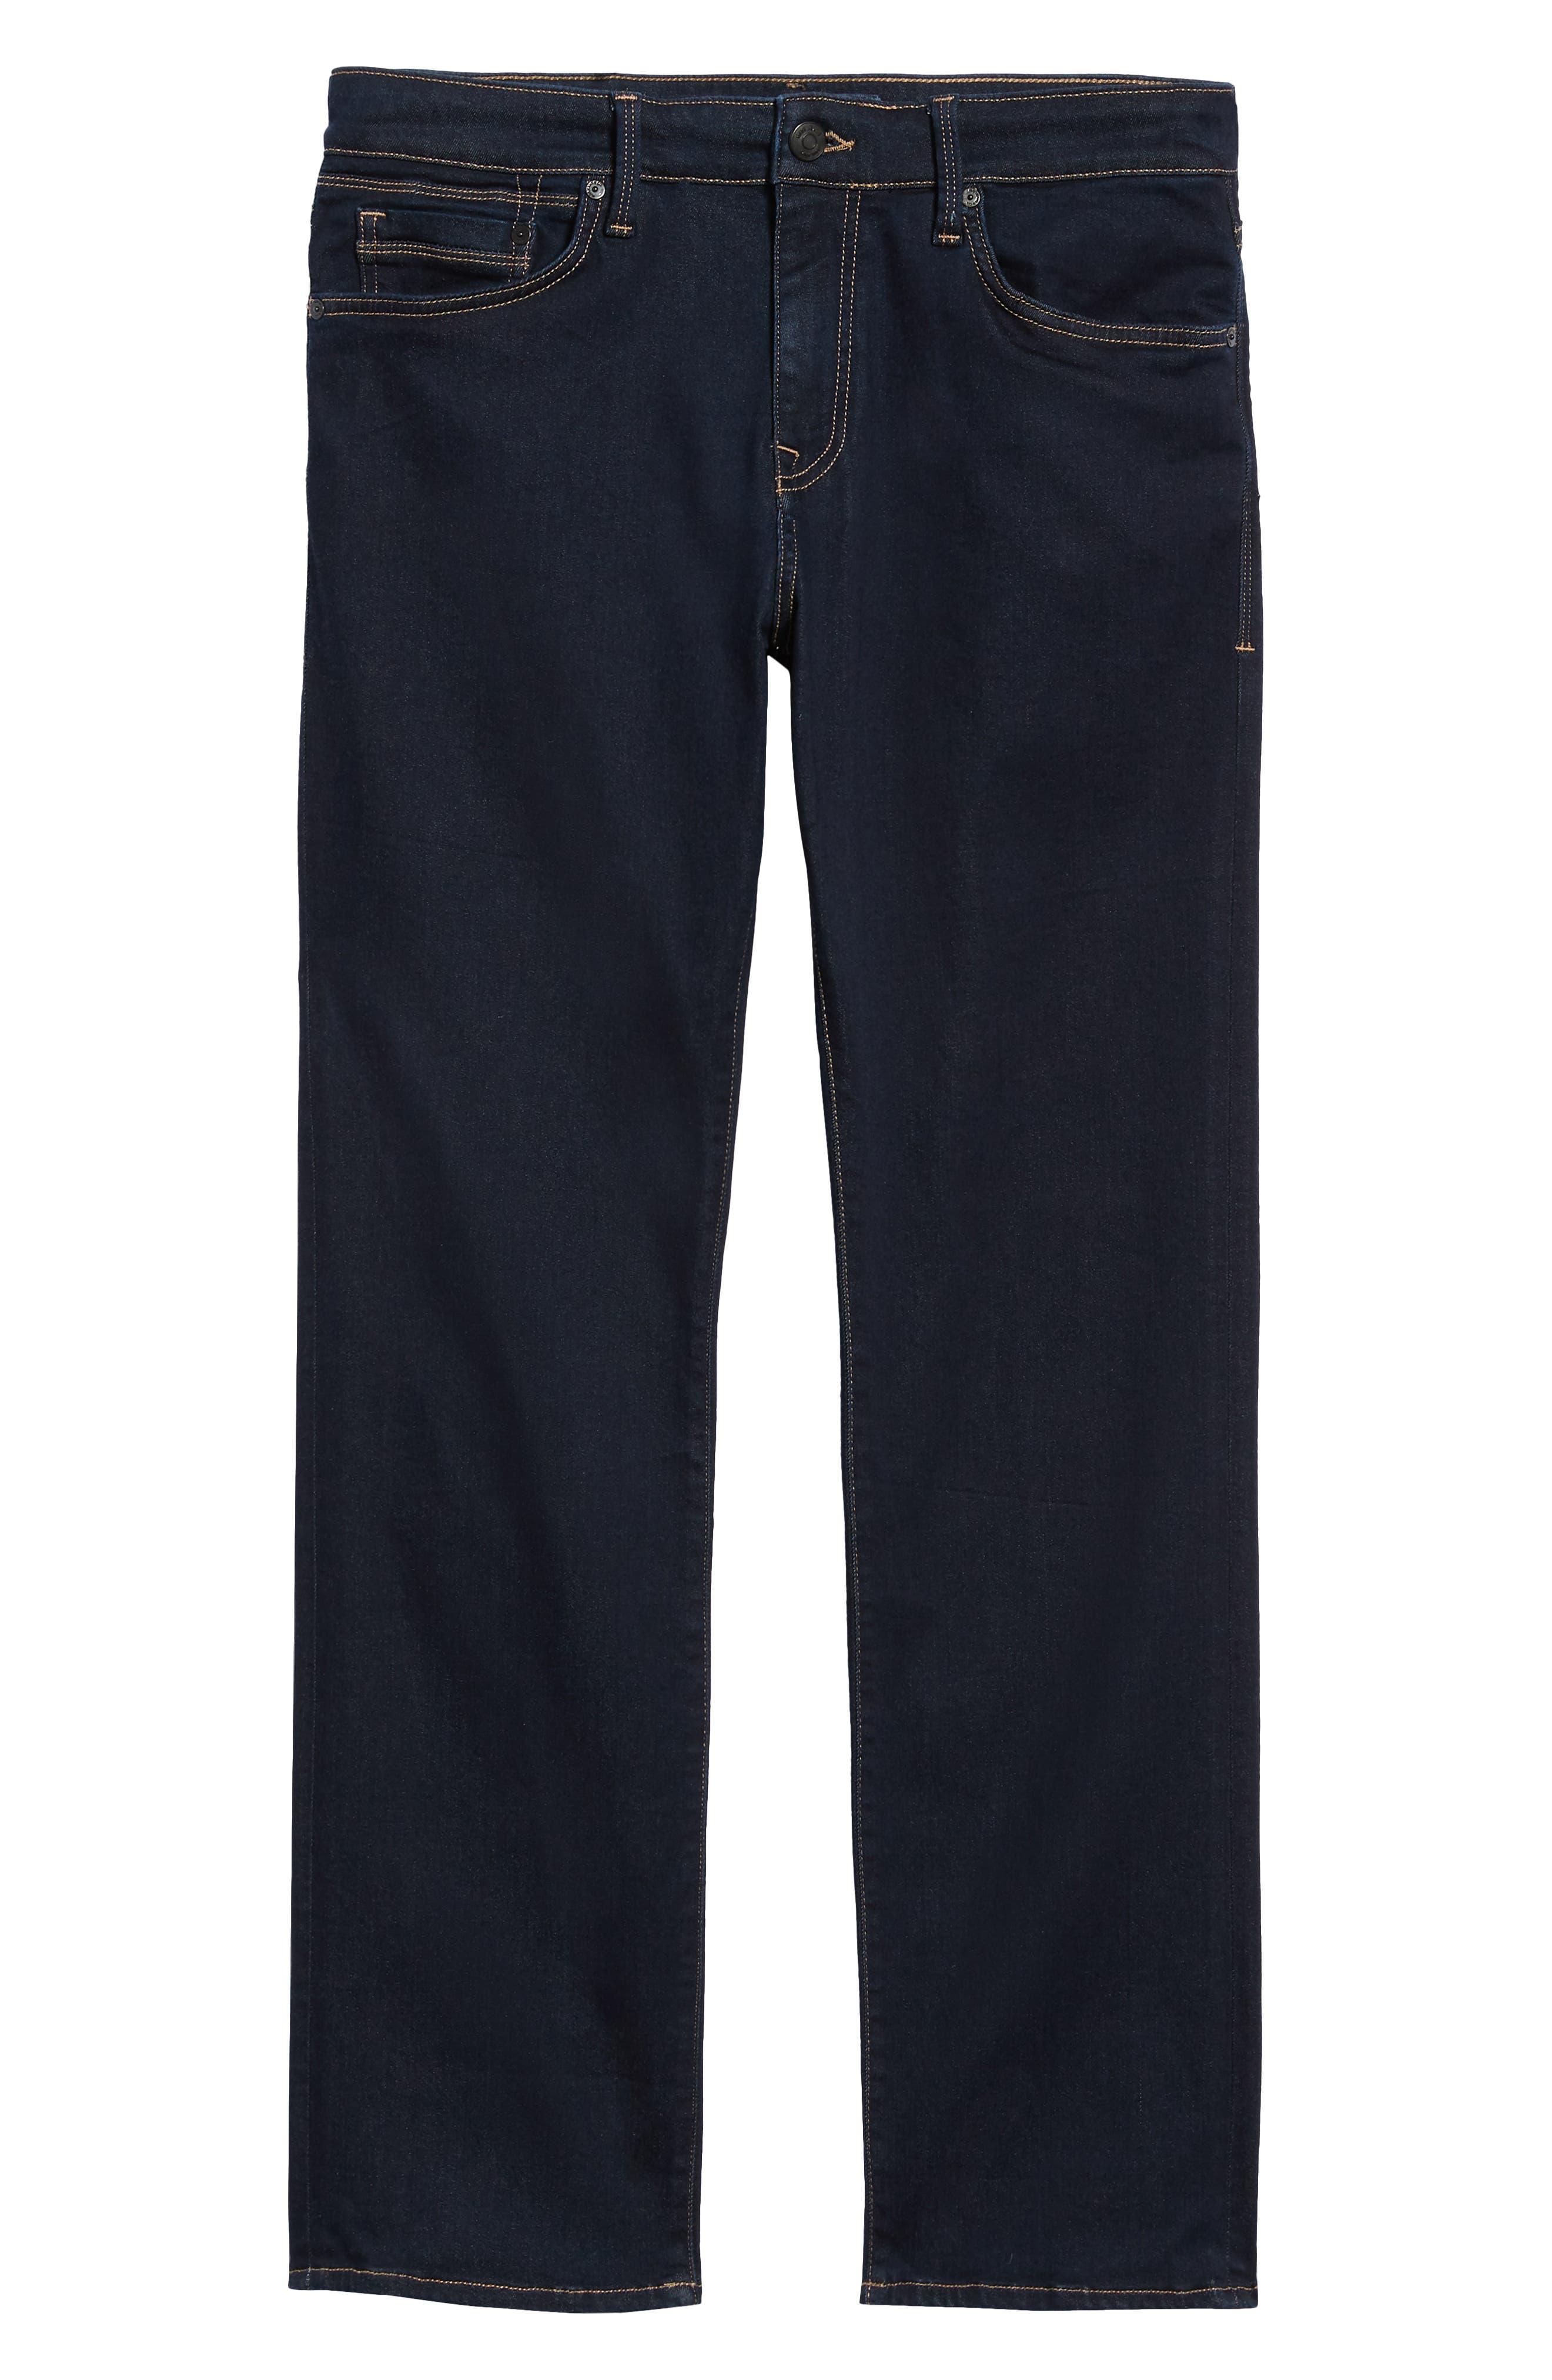 Matt Relaxed Fit Straight Leg Jeans,                             Alternate thumbnail 6, color,                             DEEP RINSE SOFT MOVE